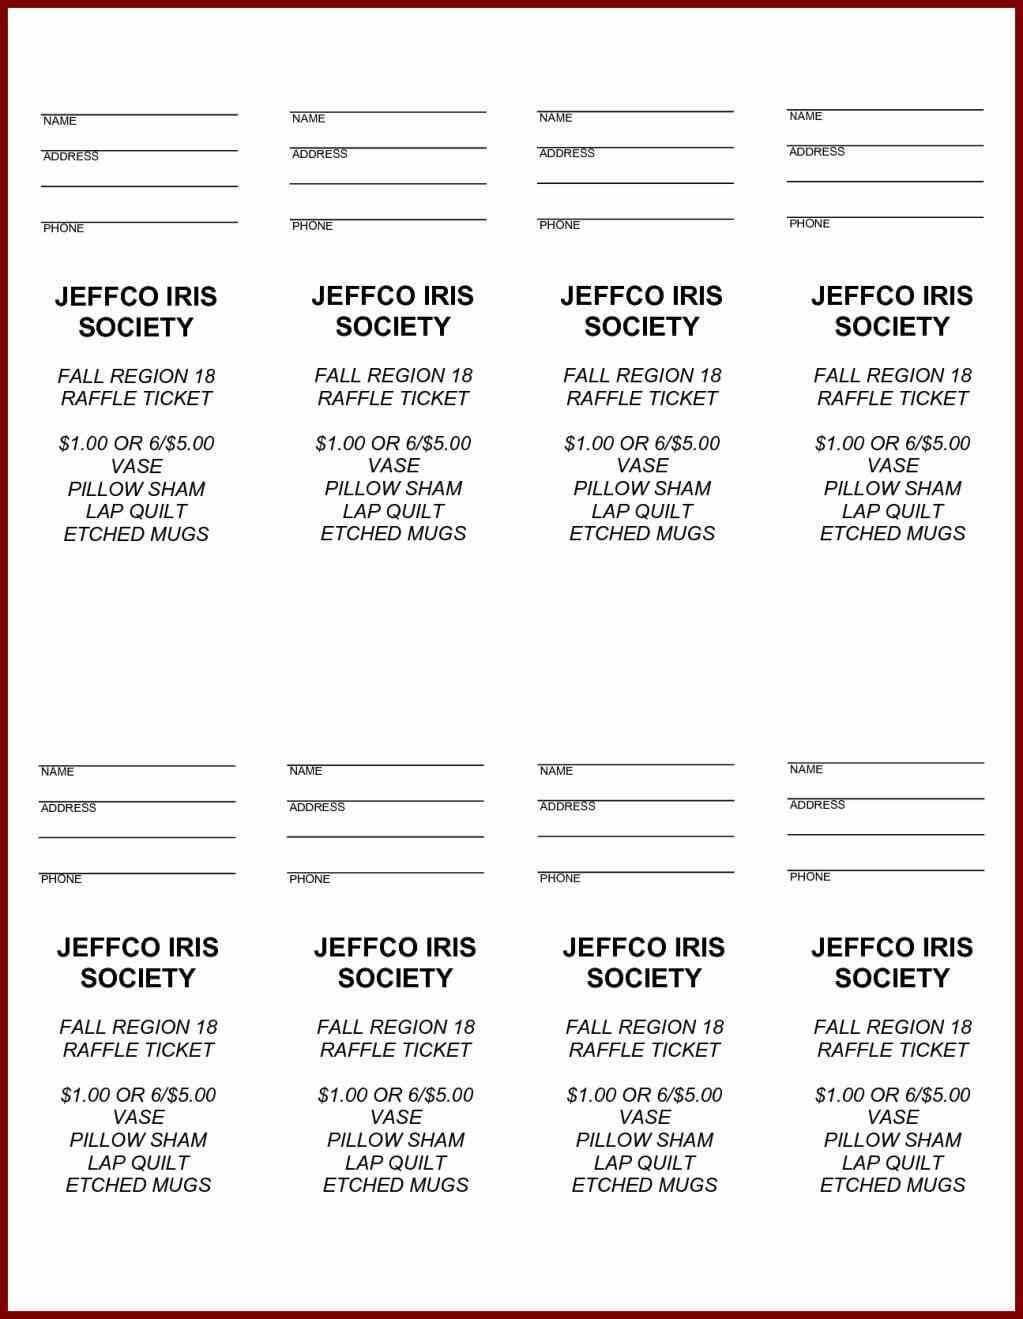 Free Printable Raffle Ticket Template Easytouse Free Raffle Inside Free Raffle Ticket Template For Word